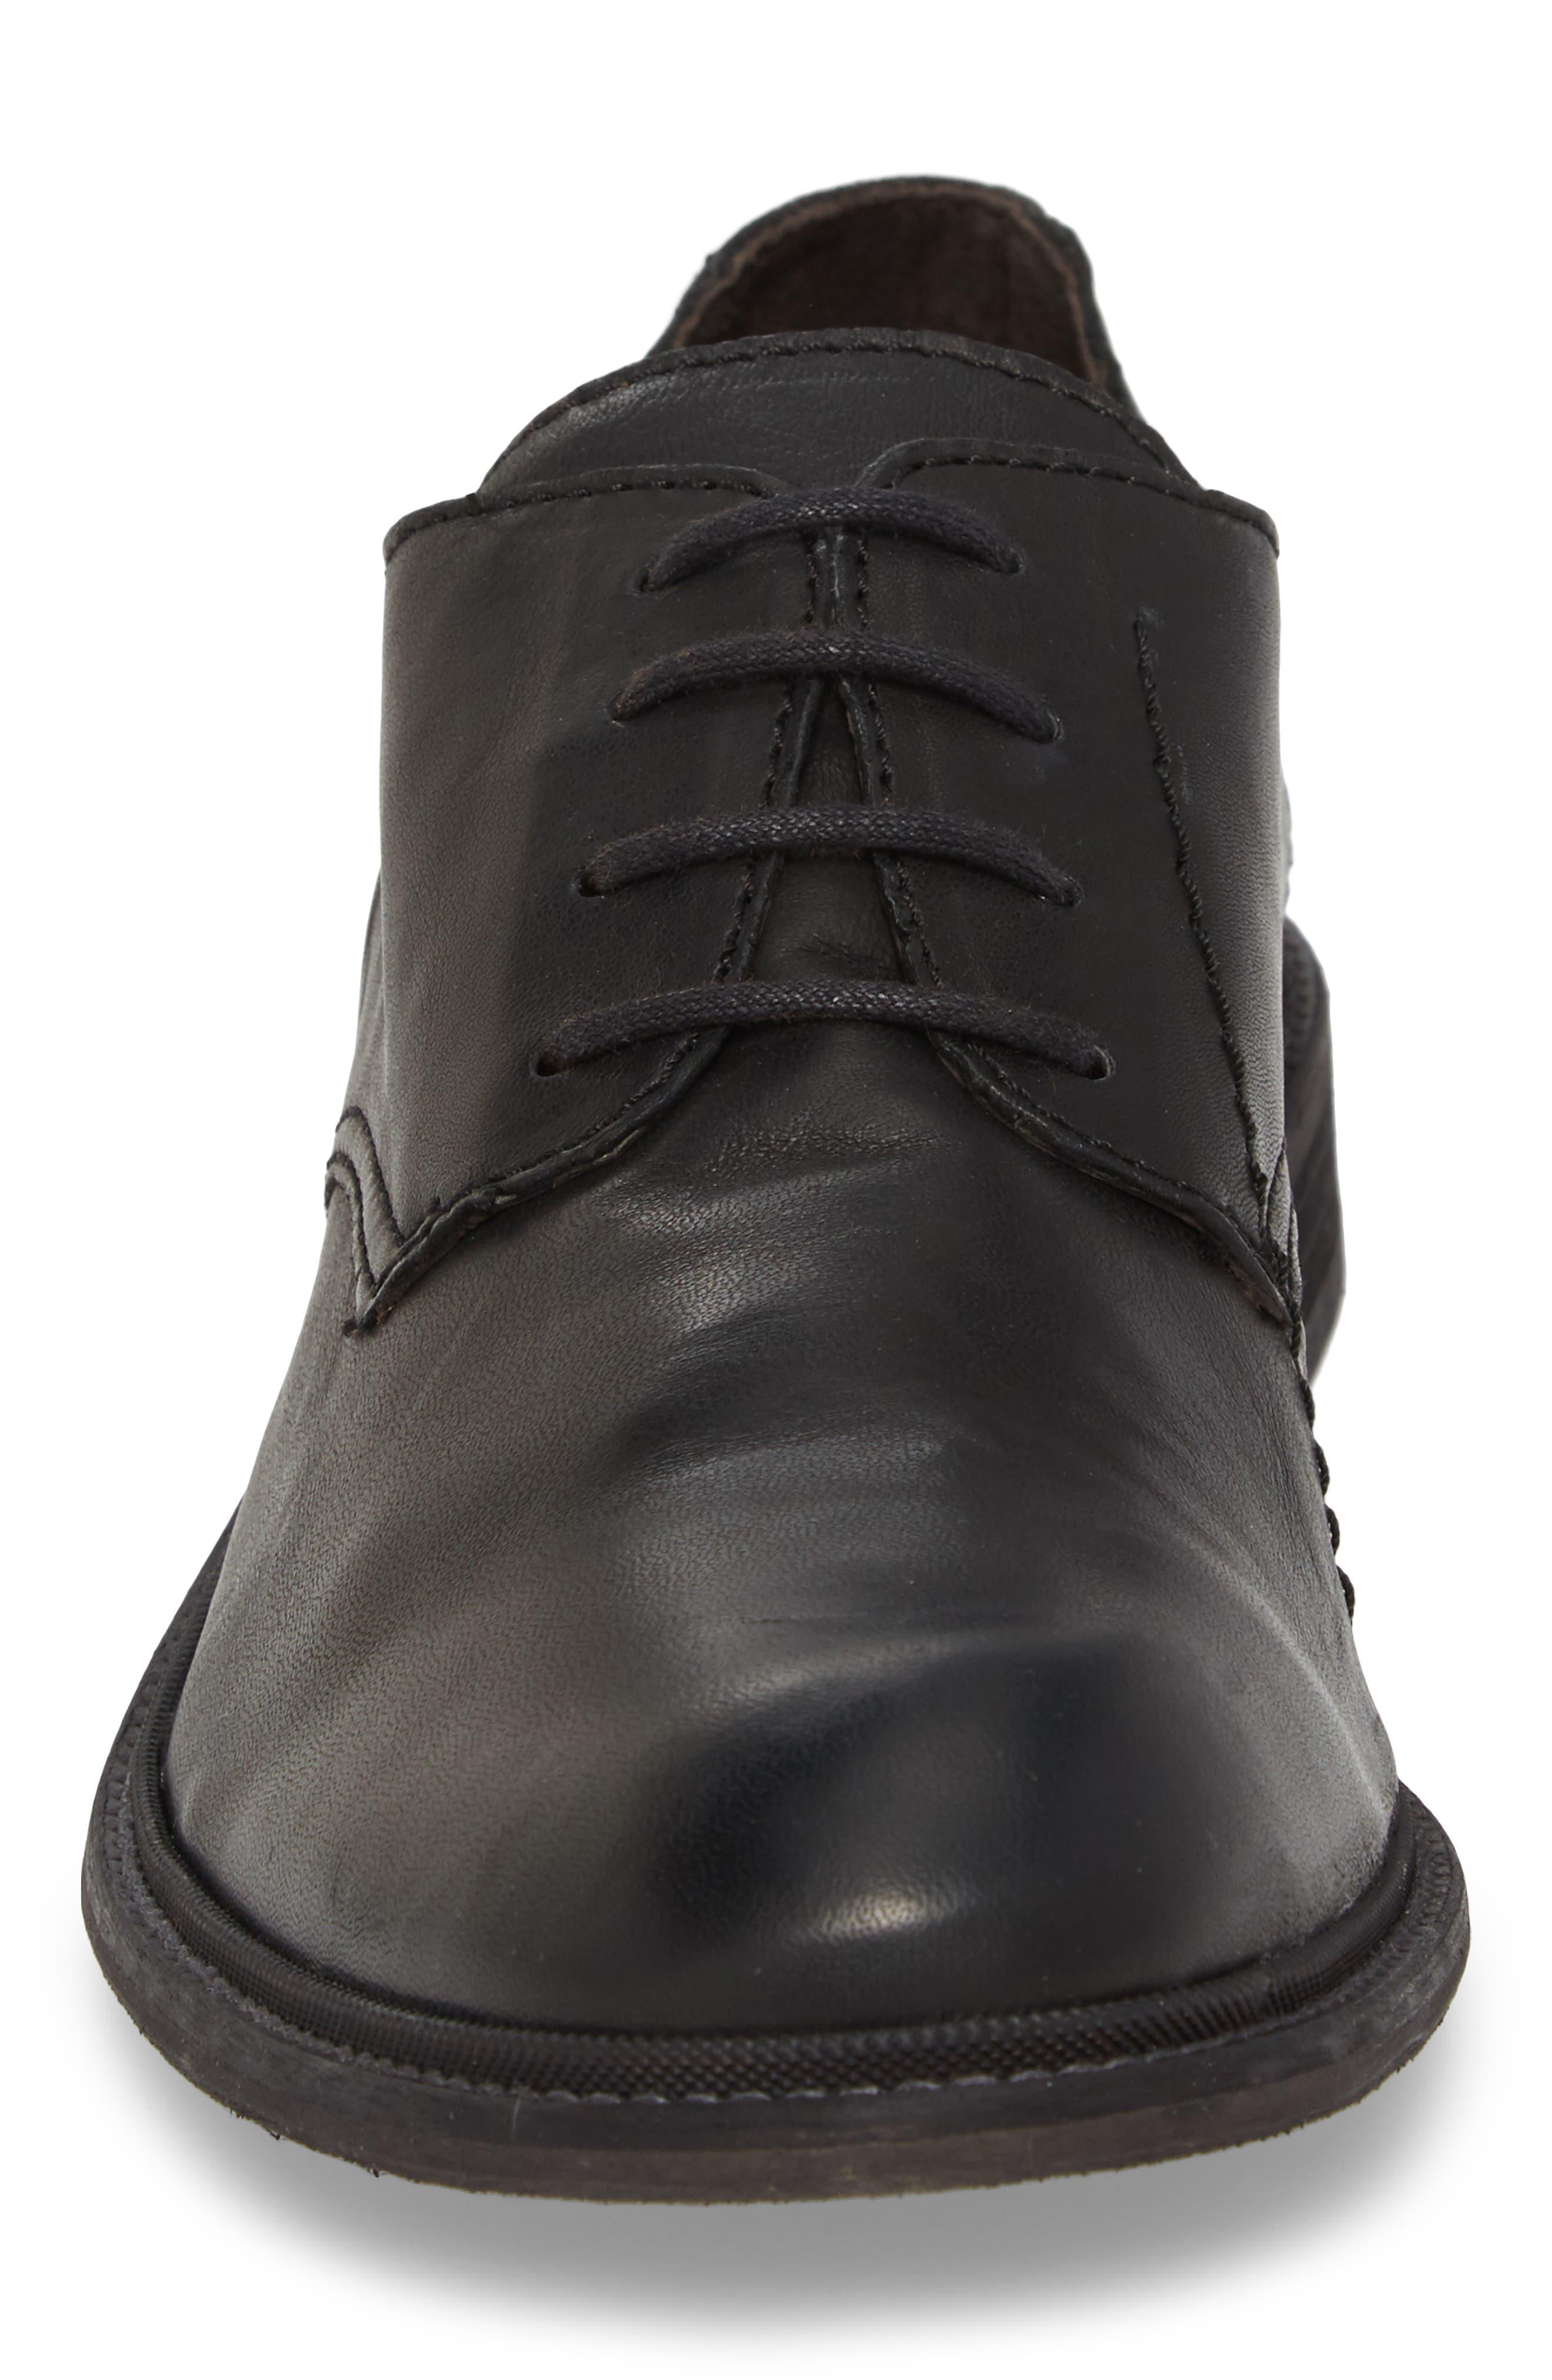 Hoco Plain Toe Derby,                             Alternate thumbnail 4, color,                             Black Leather